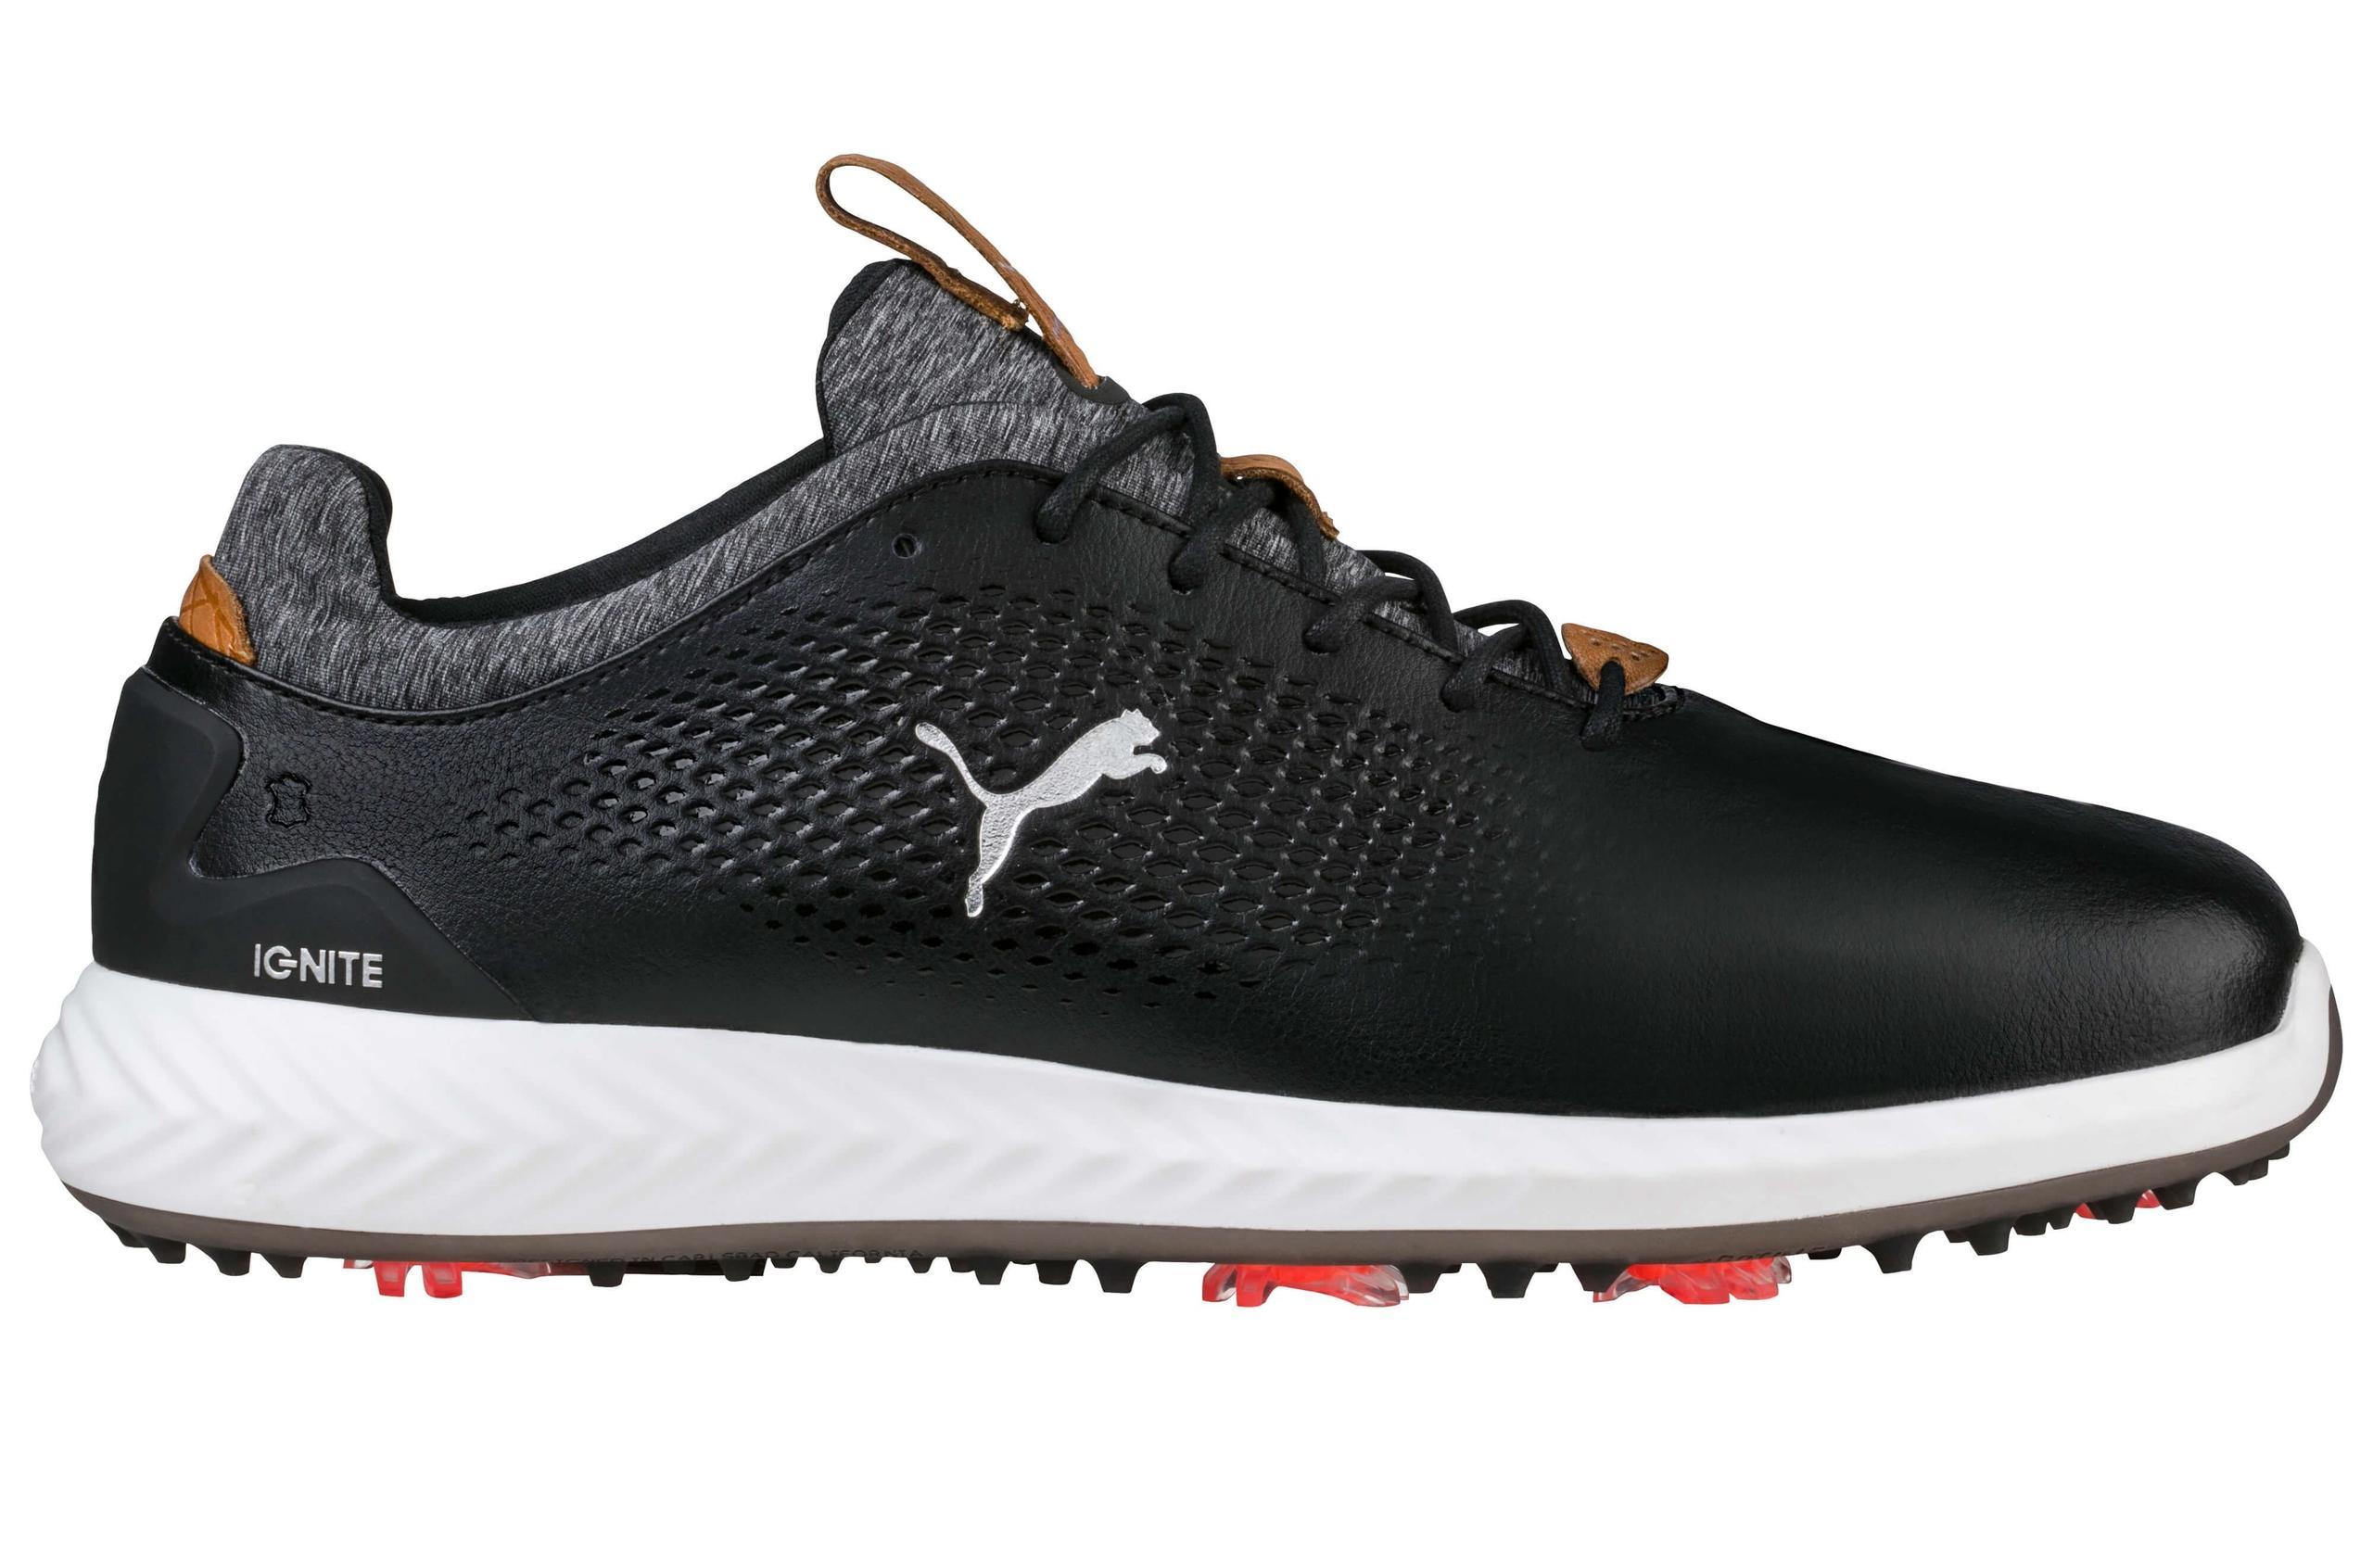 Puma Ignite Pwradapt Leather Golf Shoes Black On Sale Carl S Golfland